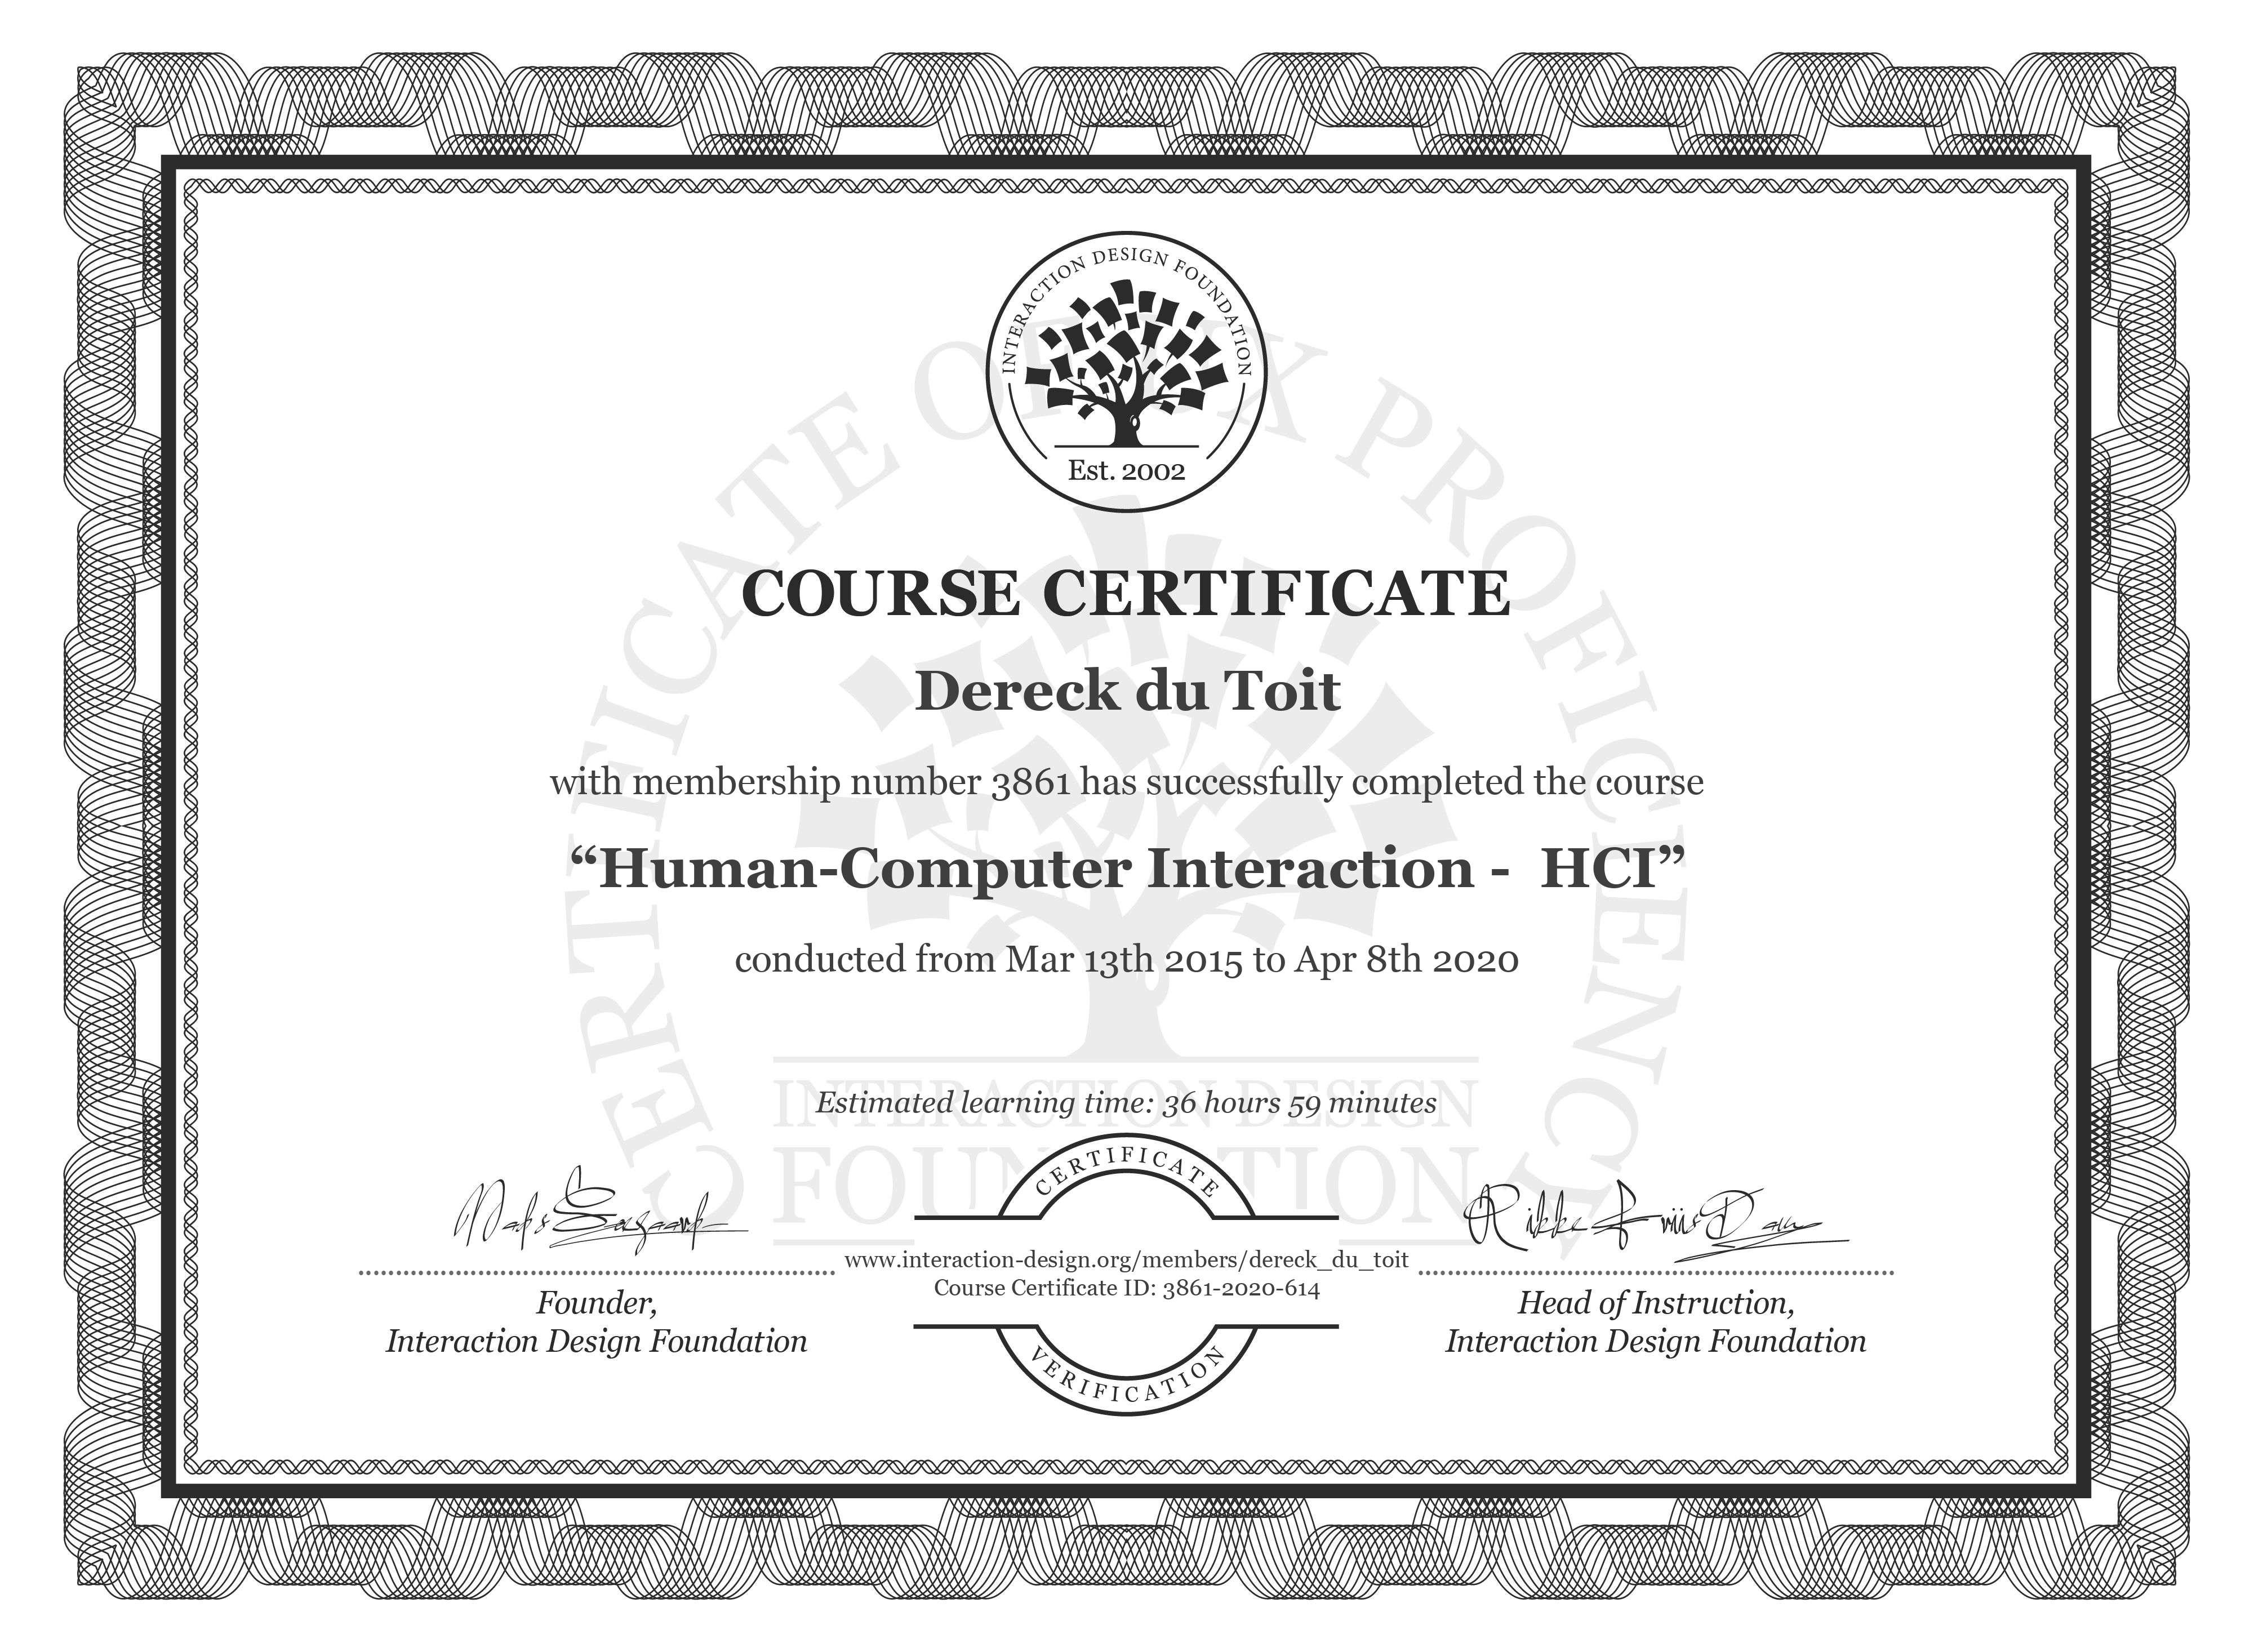 Dereck du Toit's Course Certificate: Human-Computer Interaction -  HCI